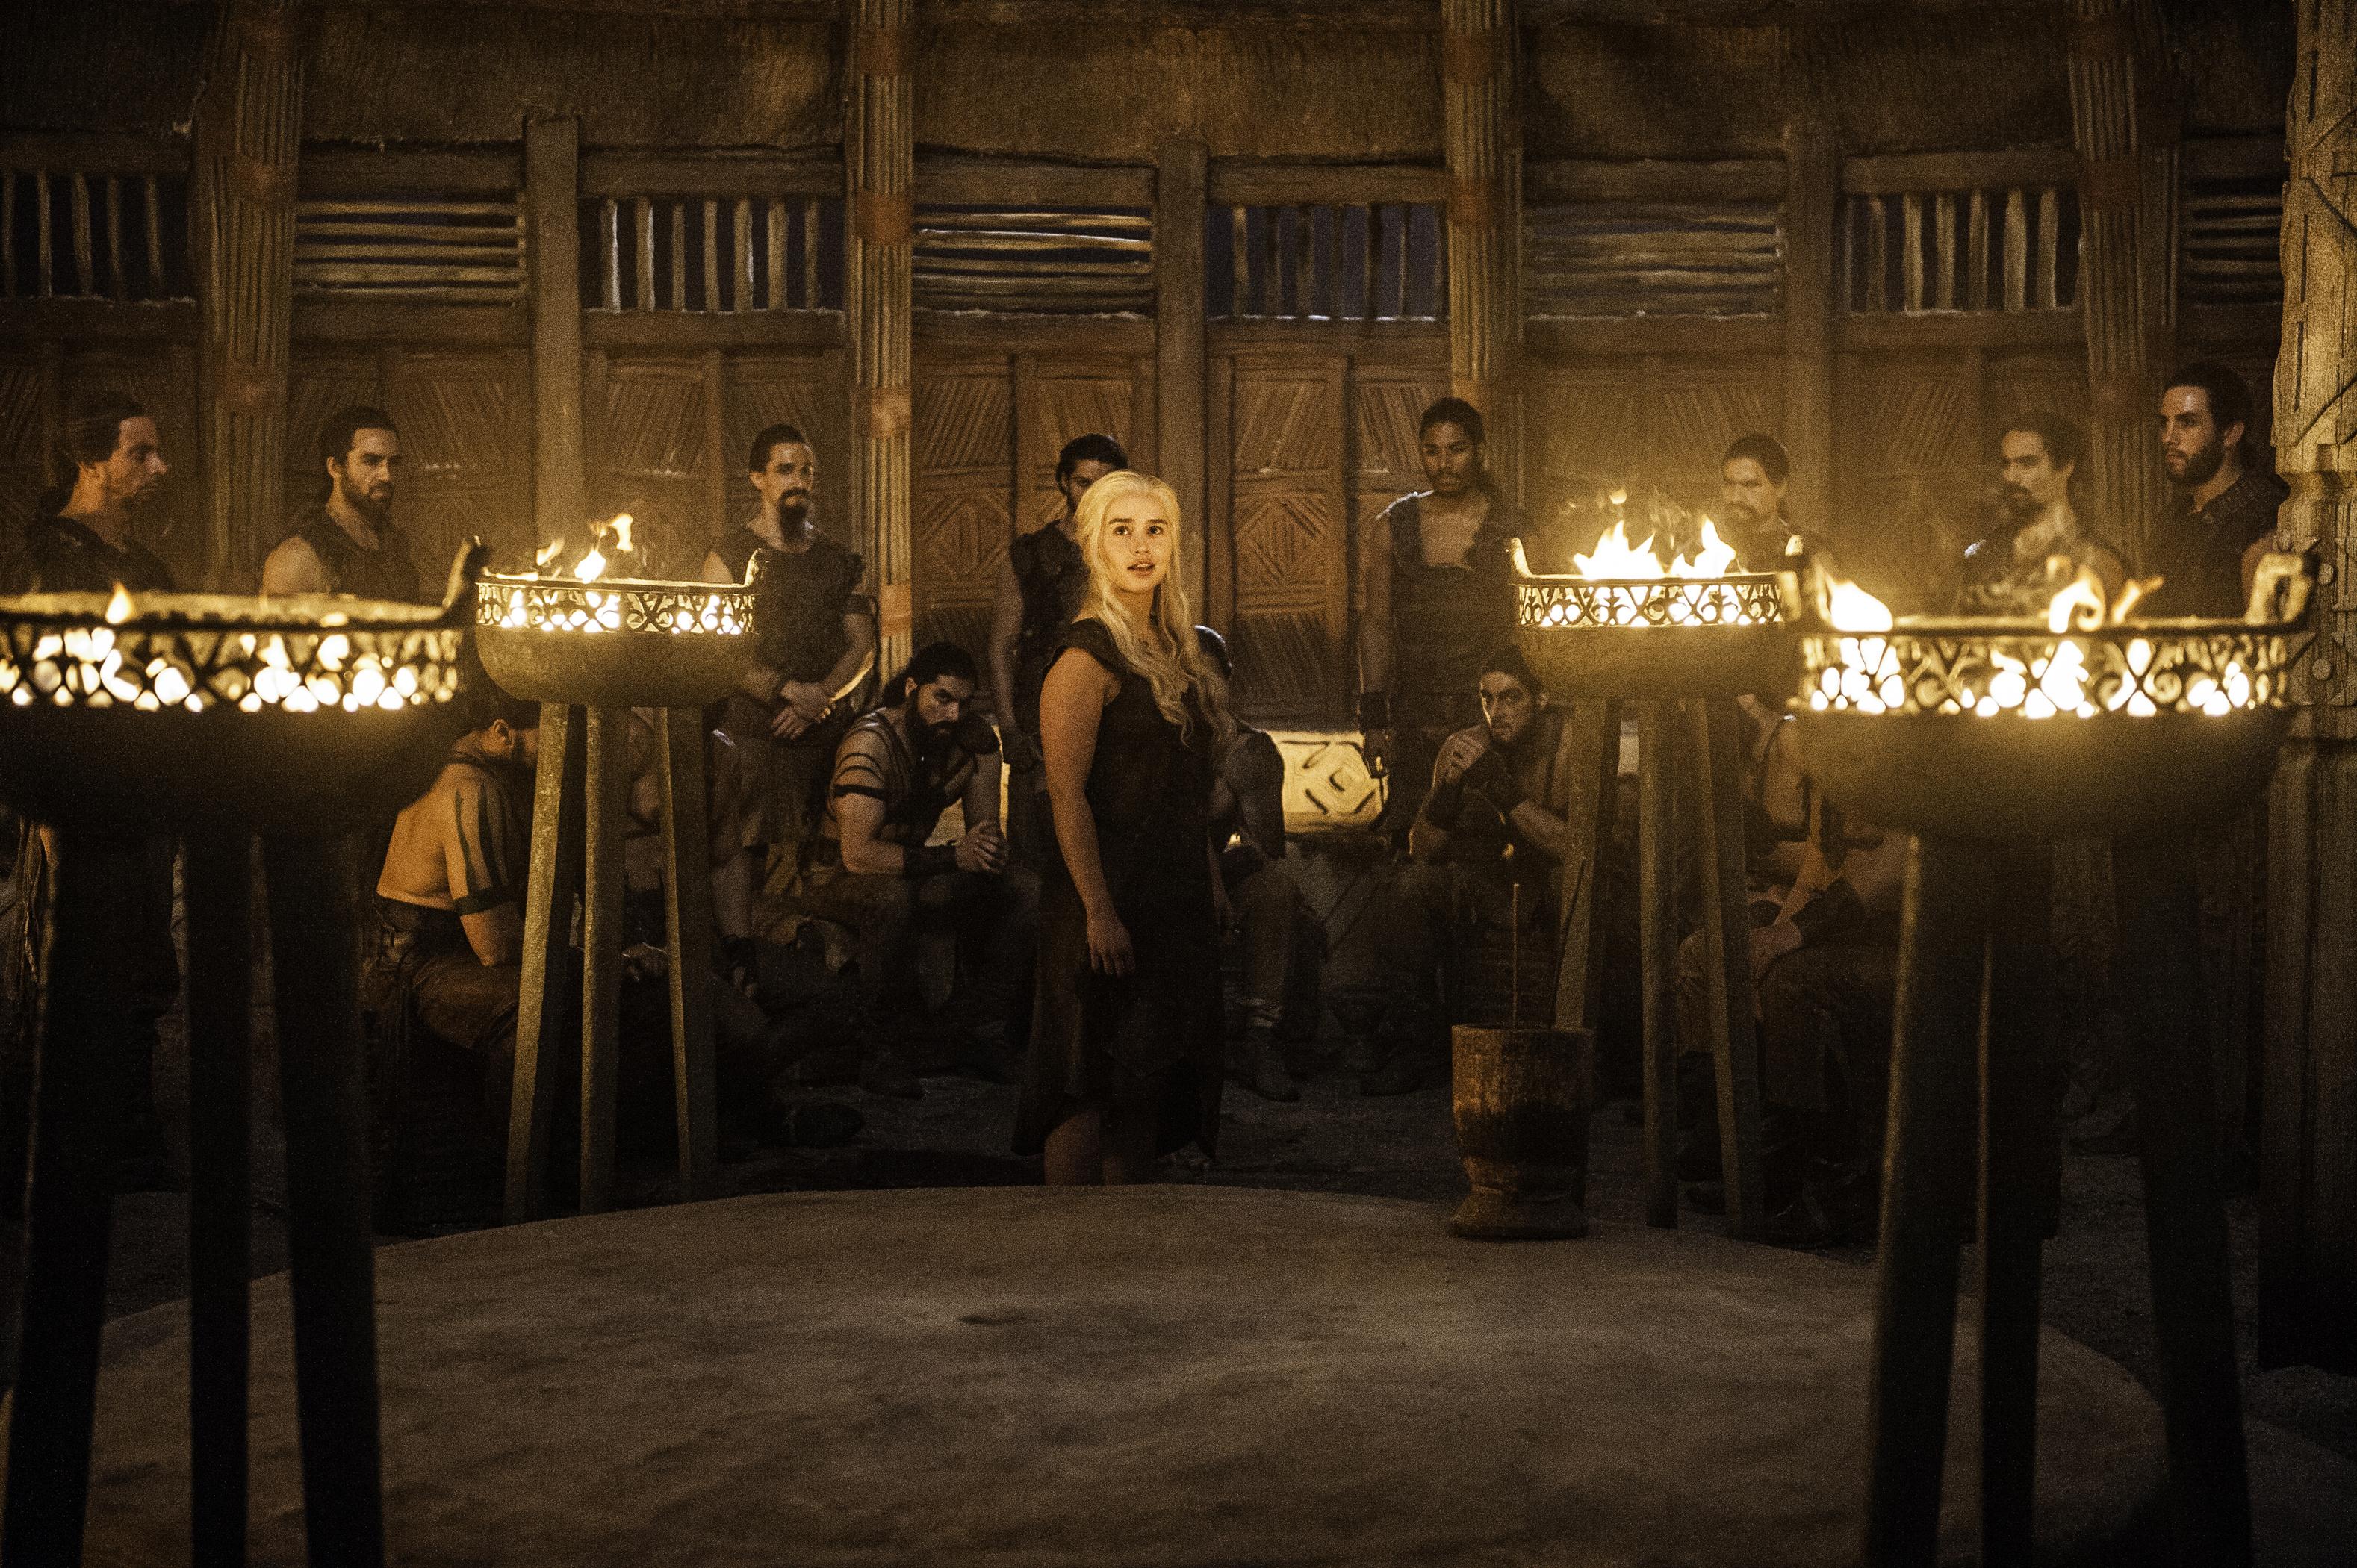 dany-game-of-thrones-s6e4-dosh-khaleen